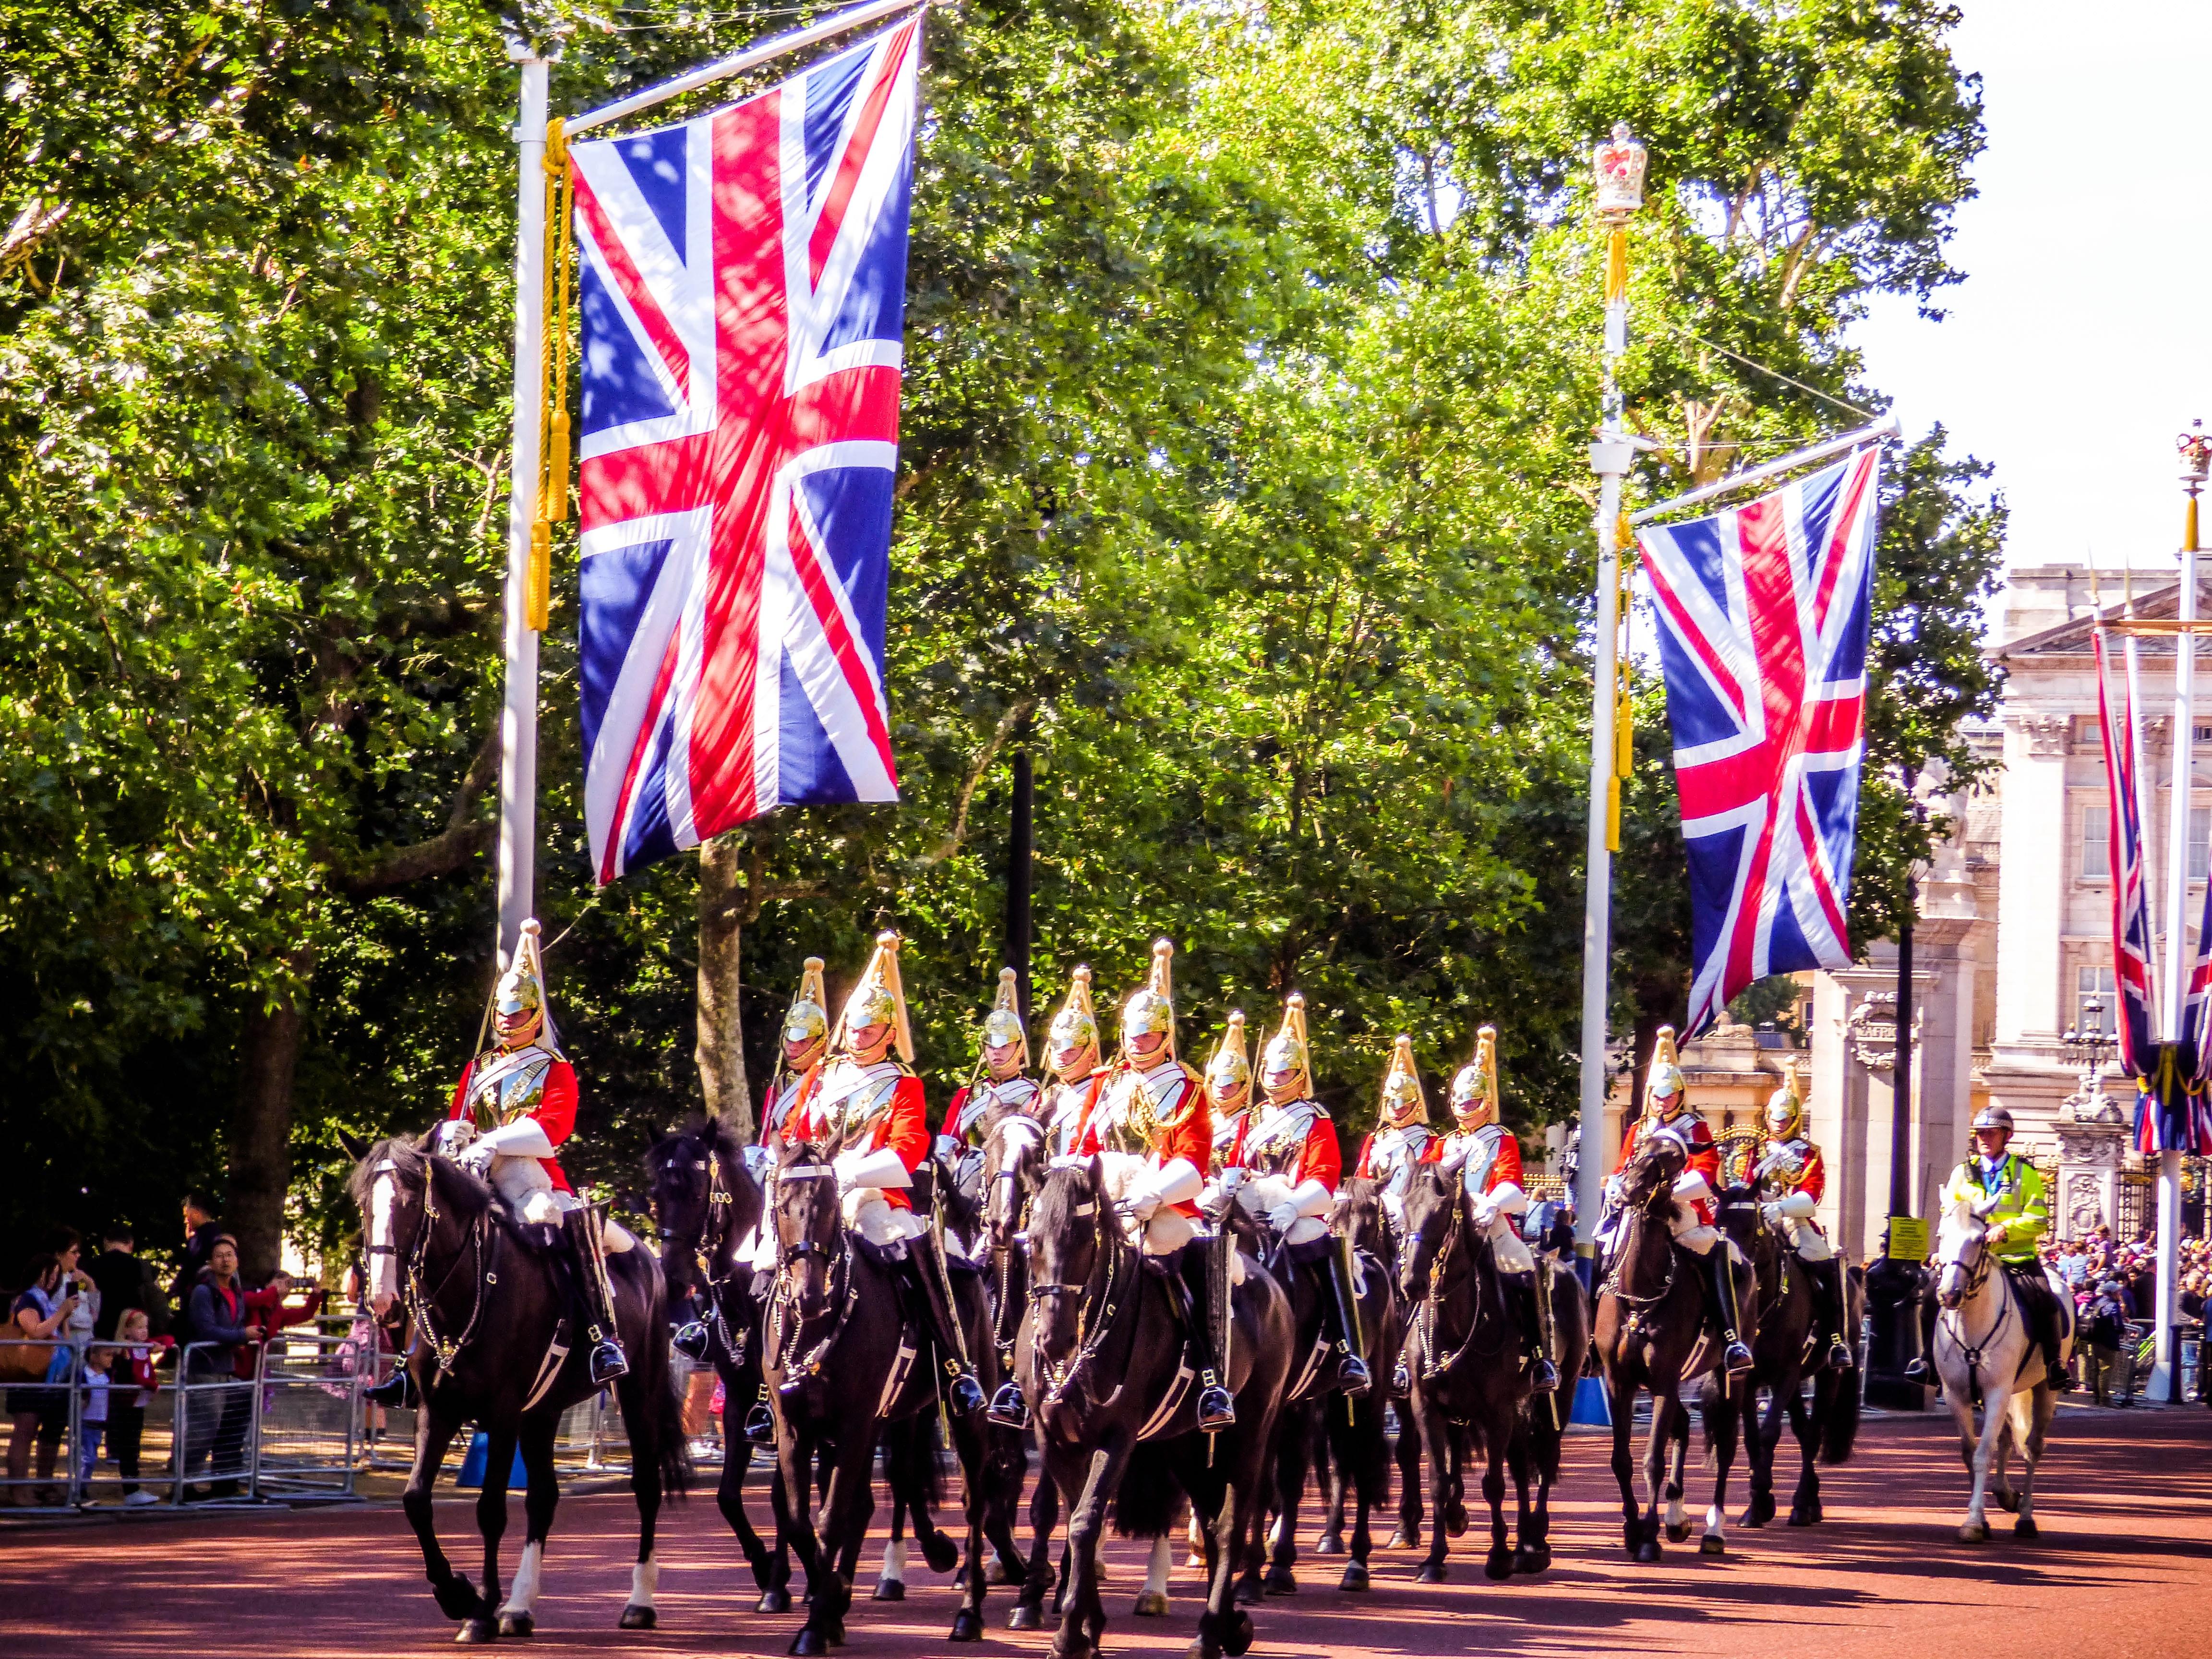 Free Images : british, cavalry, ceremonial, ceremony, city, crowd, democracy, england, english ...